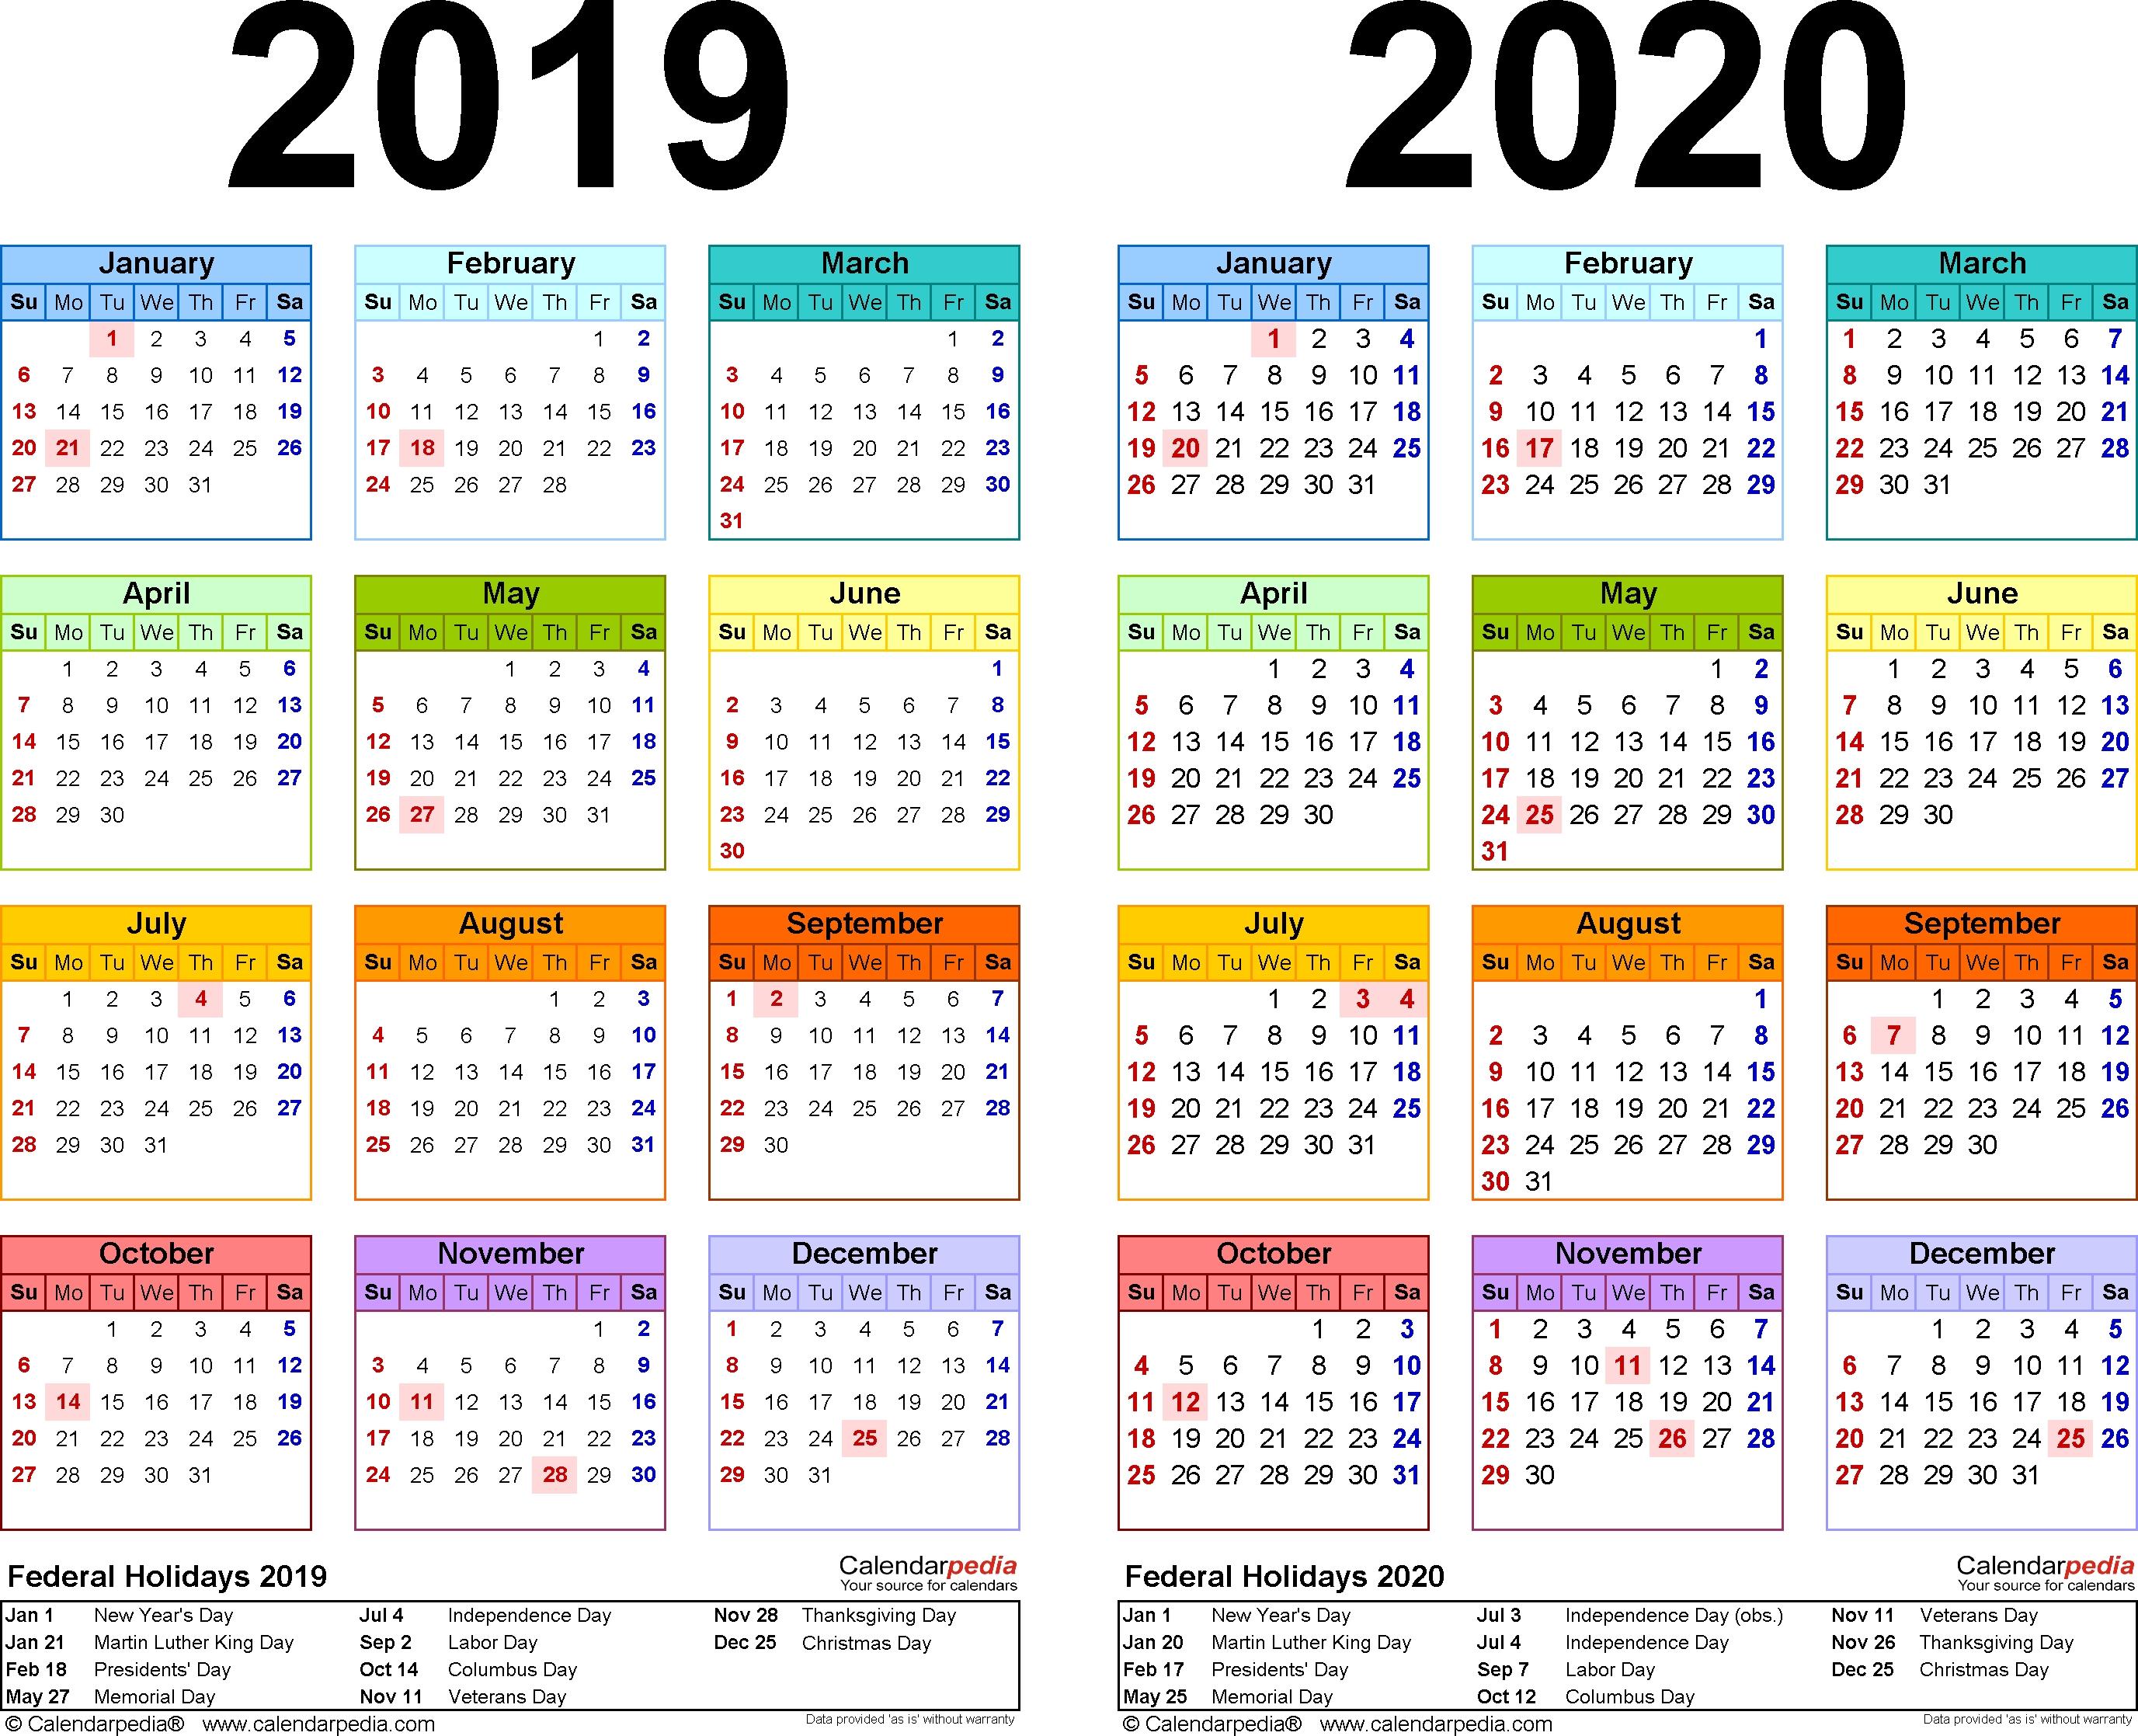 2019-2020 Calendar - Free Printable Two-Year Pdf Calendars within Calendar 2020 Year At A Glance Free Printable